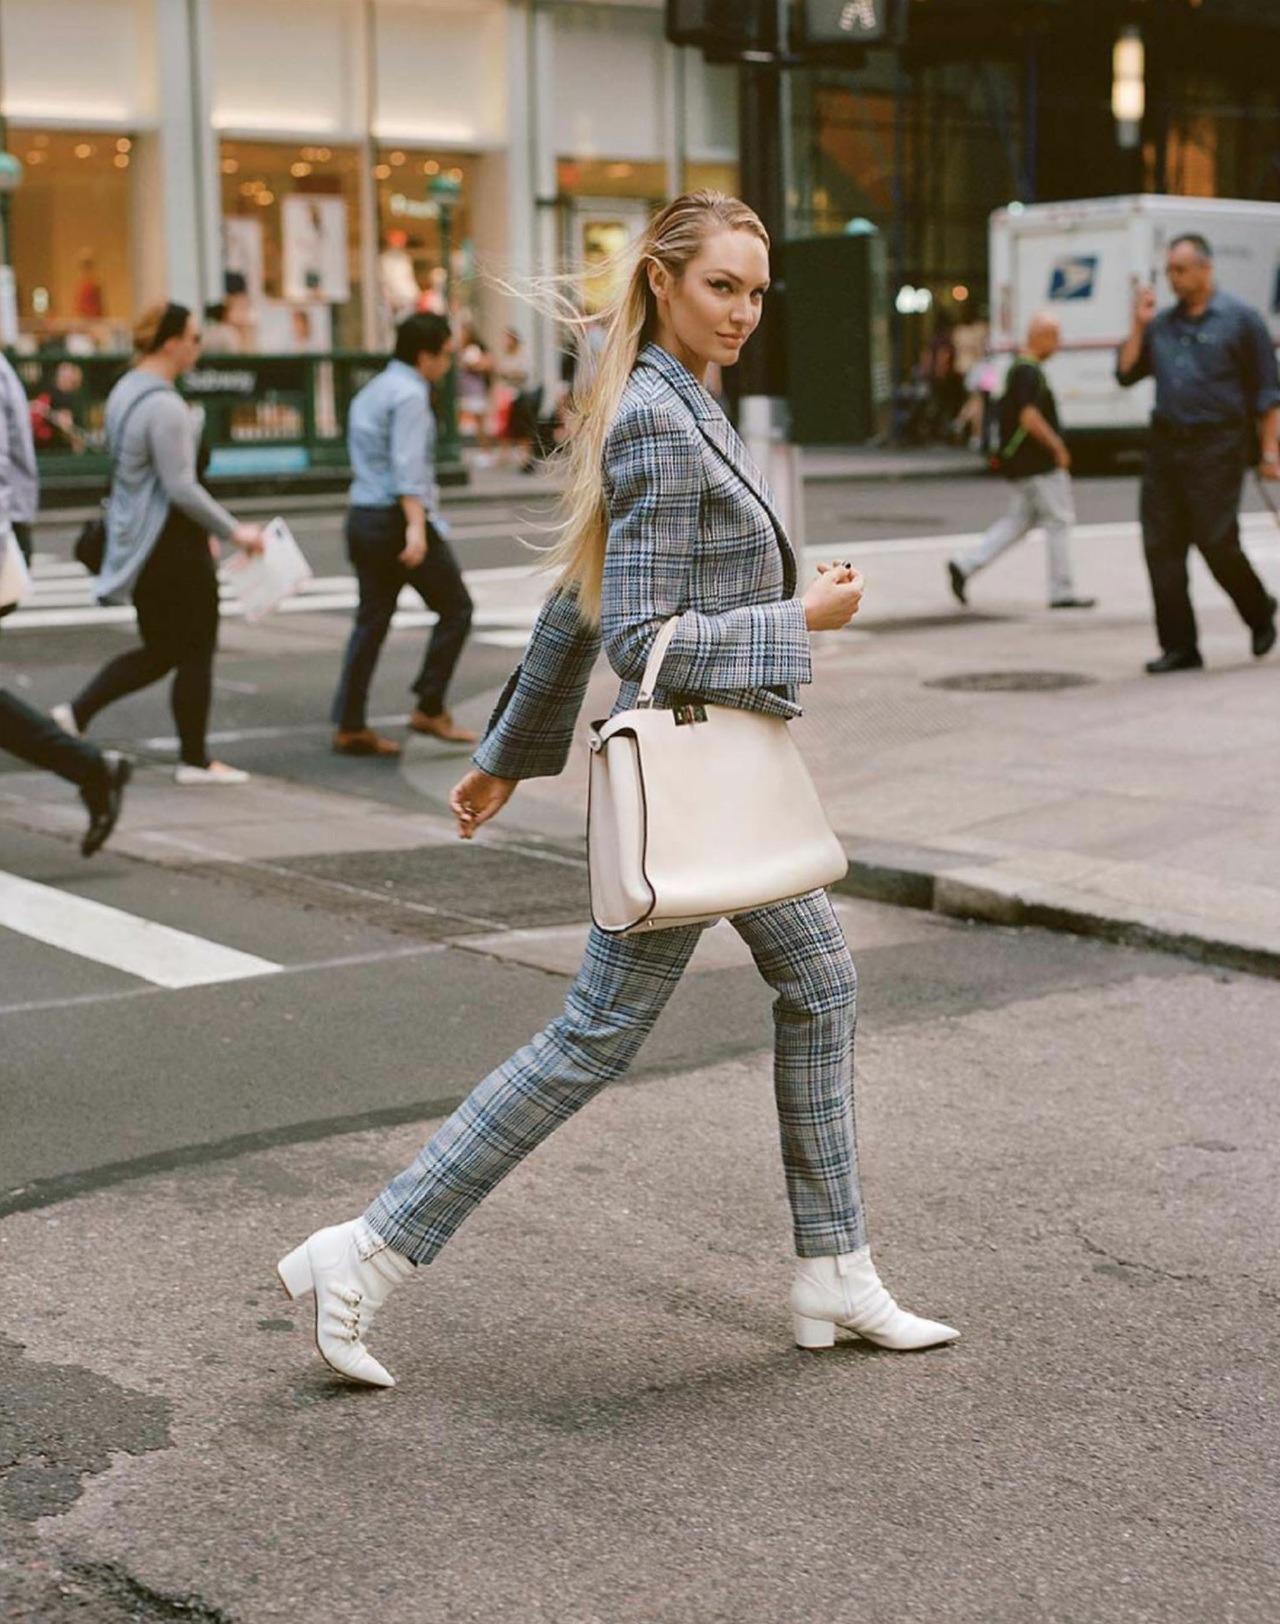 alittleagency melissa  Candice & Romee | Vogue August 2017